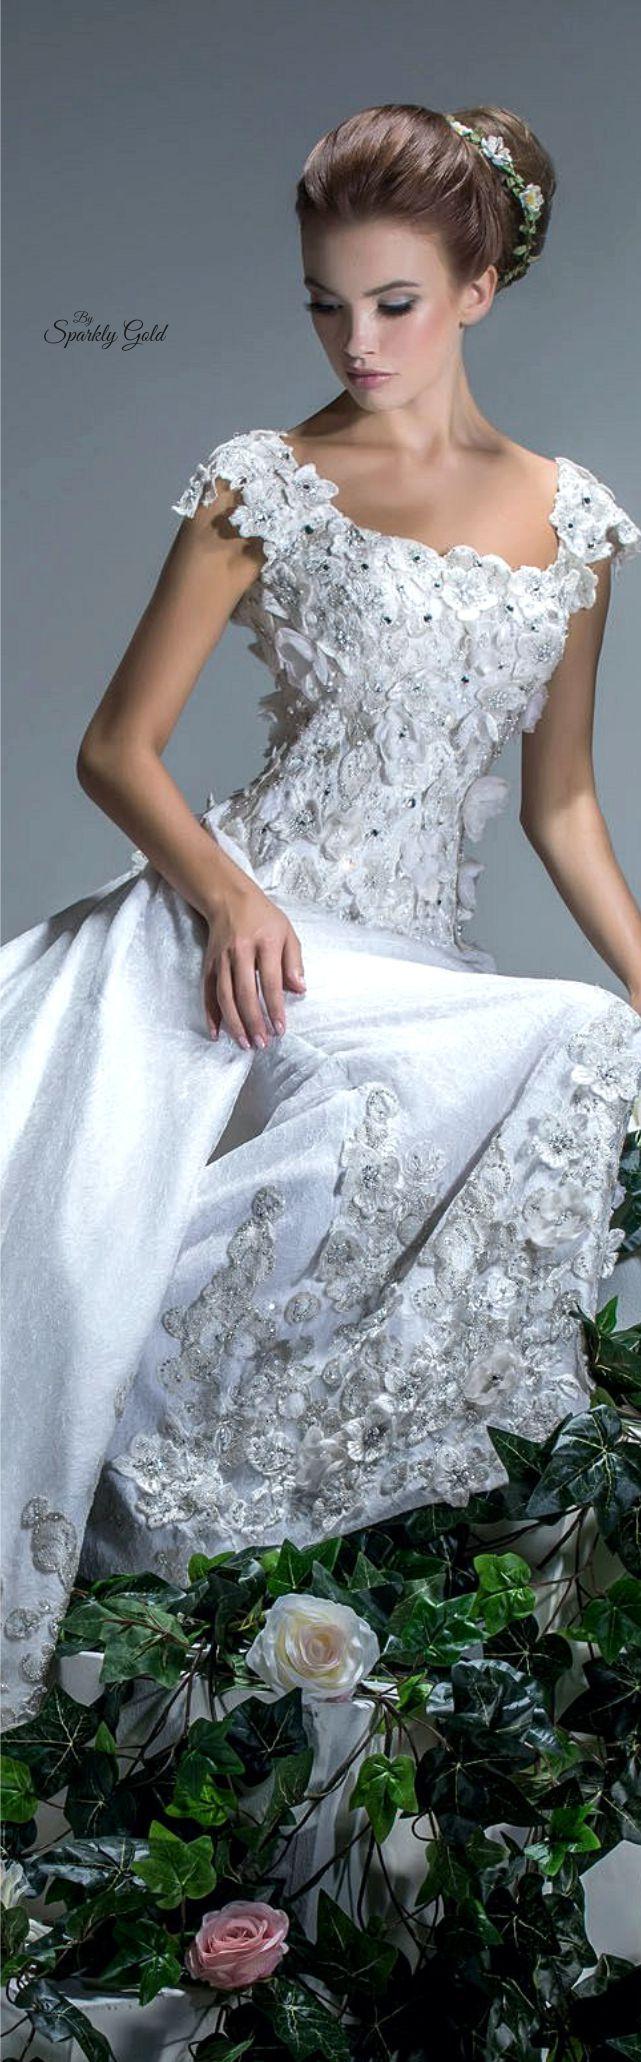 4245 best Weddings images on Pinterest | Gown wedding, Flower girls ...